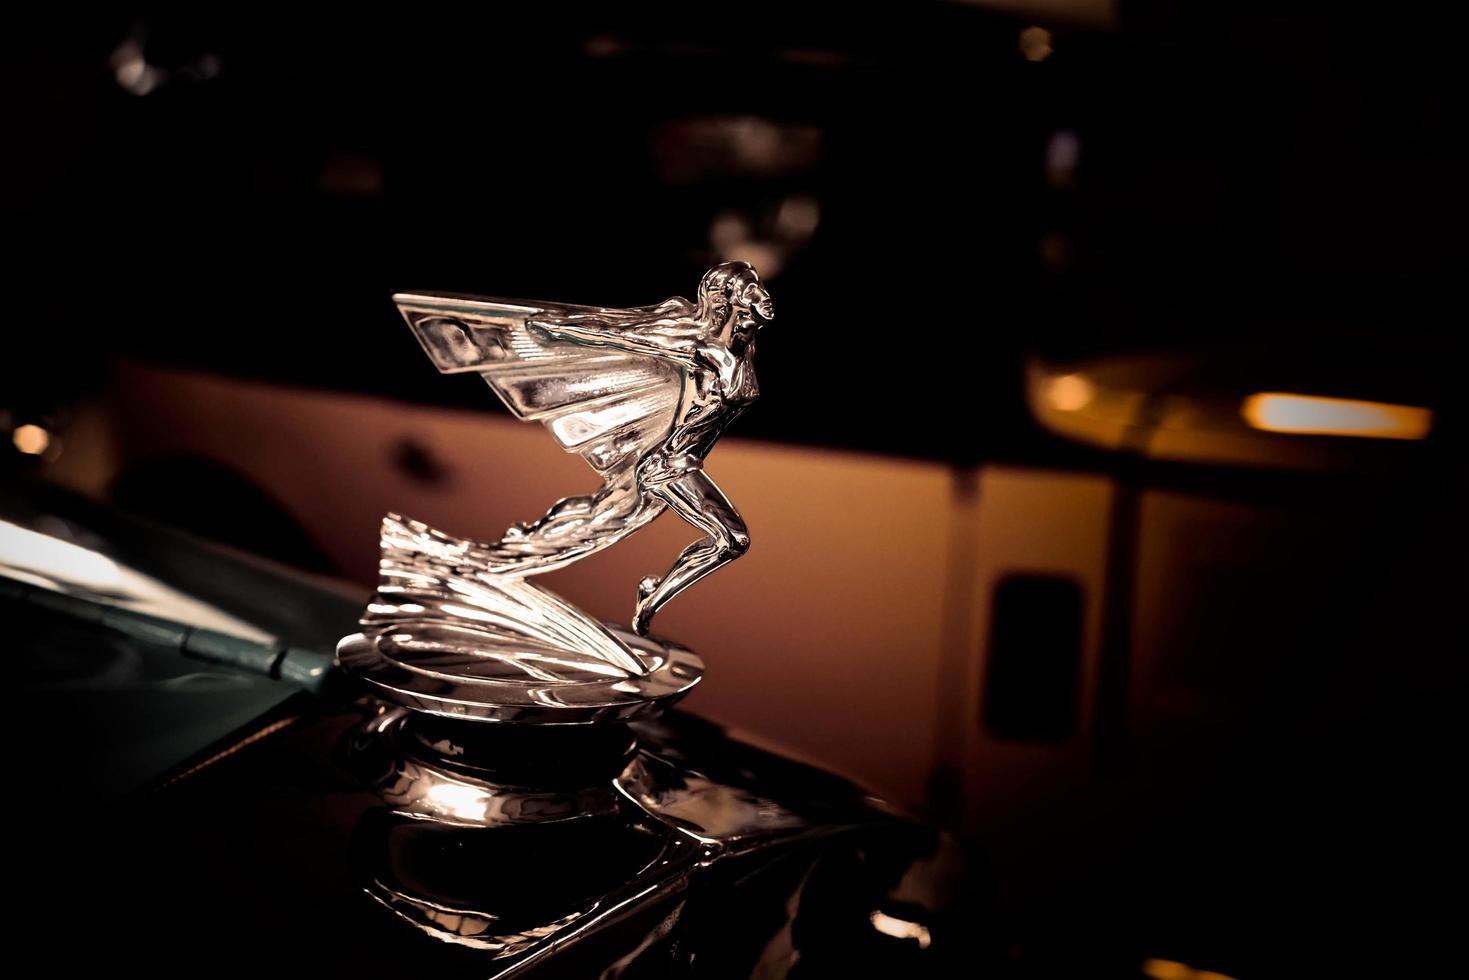 2016 - editorial ilustrativa de una parrilla de automóvil graham-paige foto